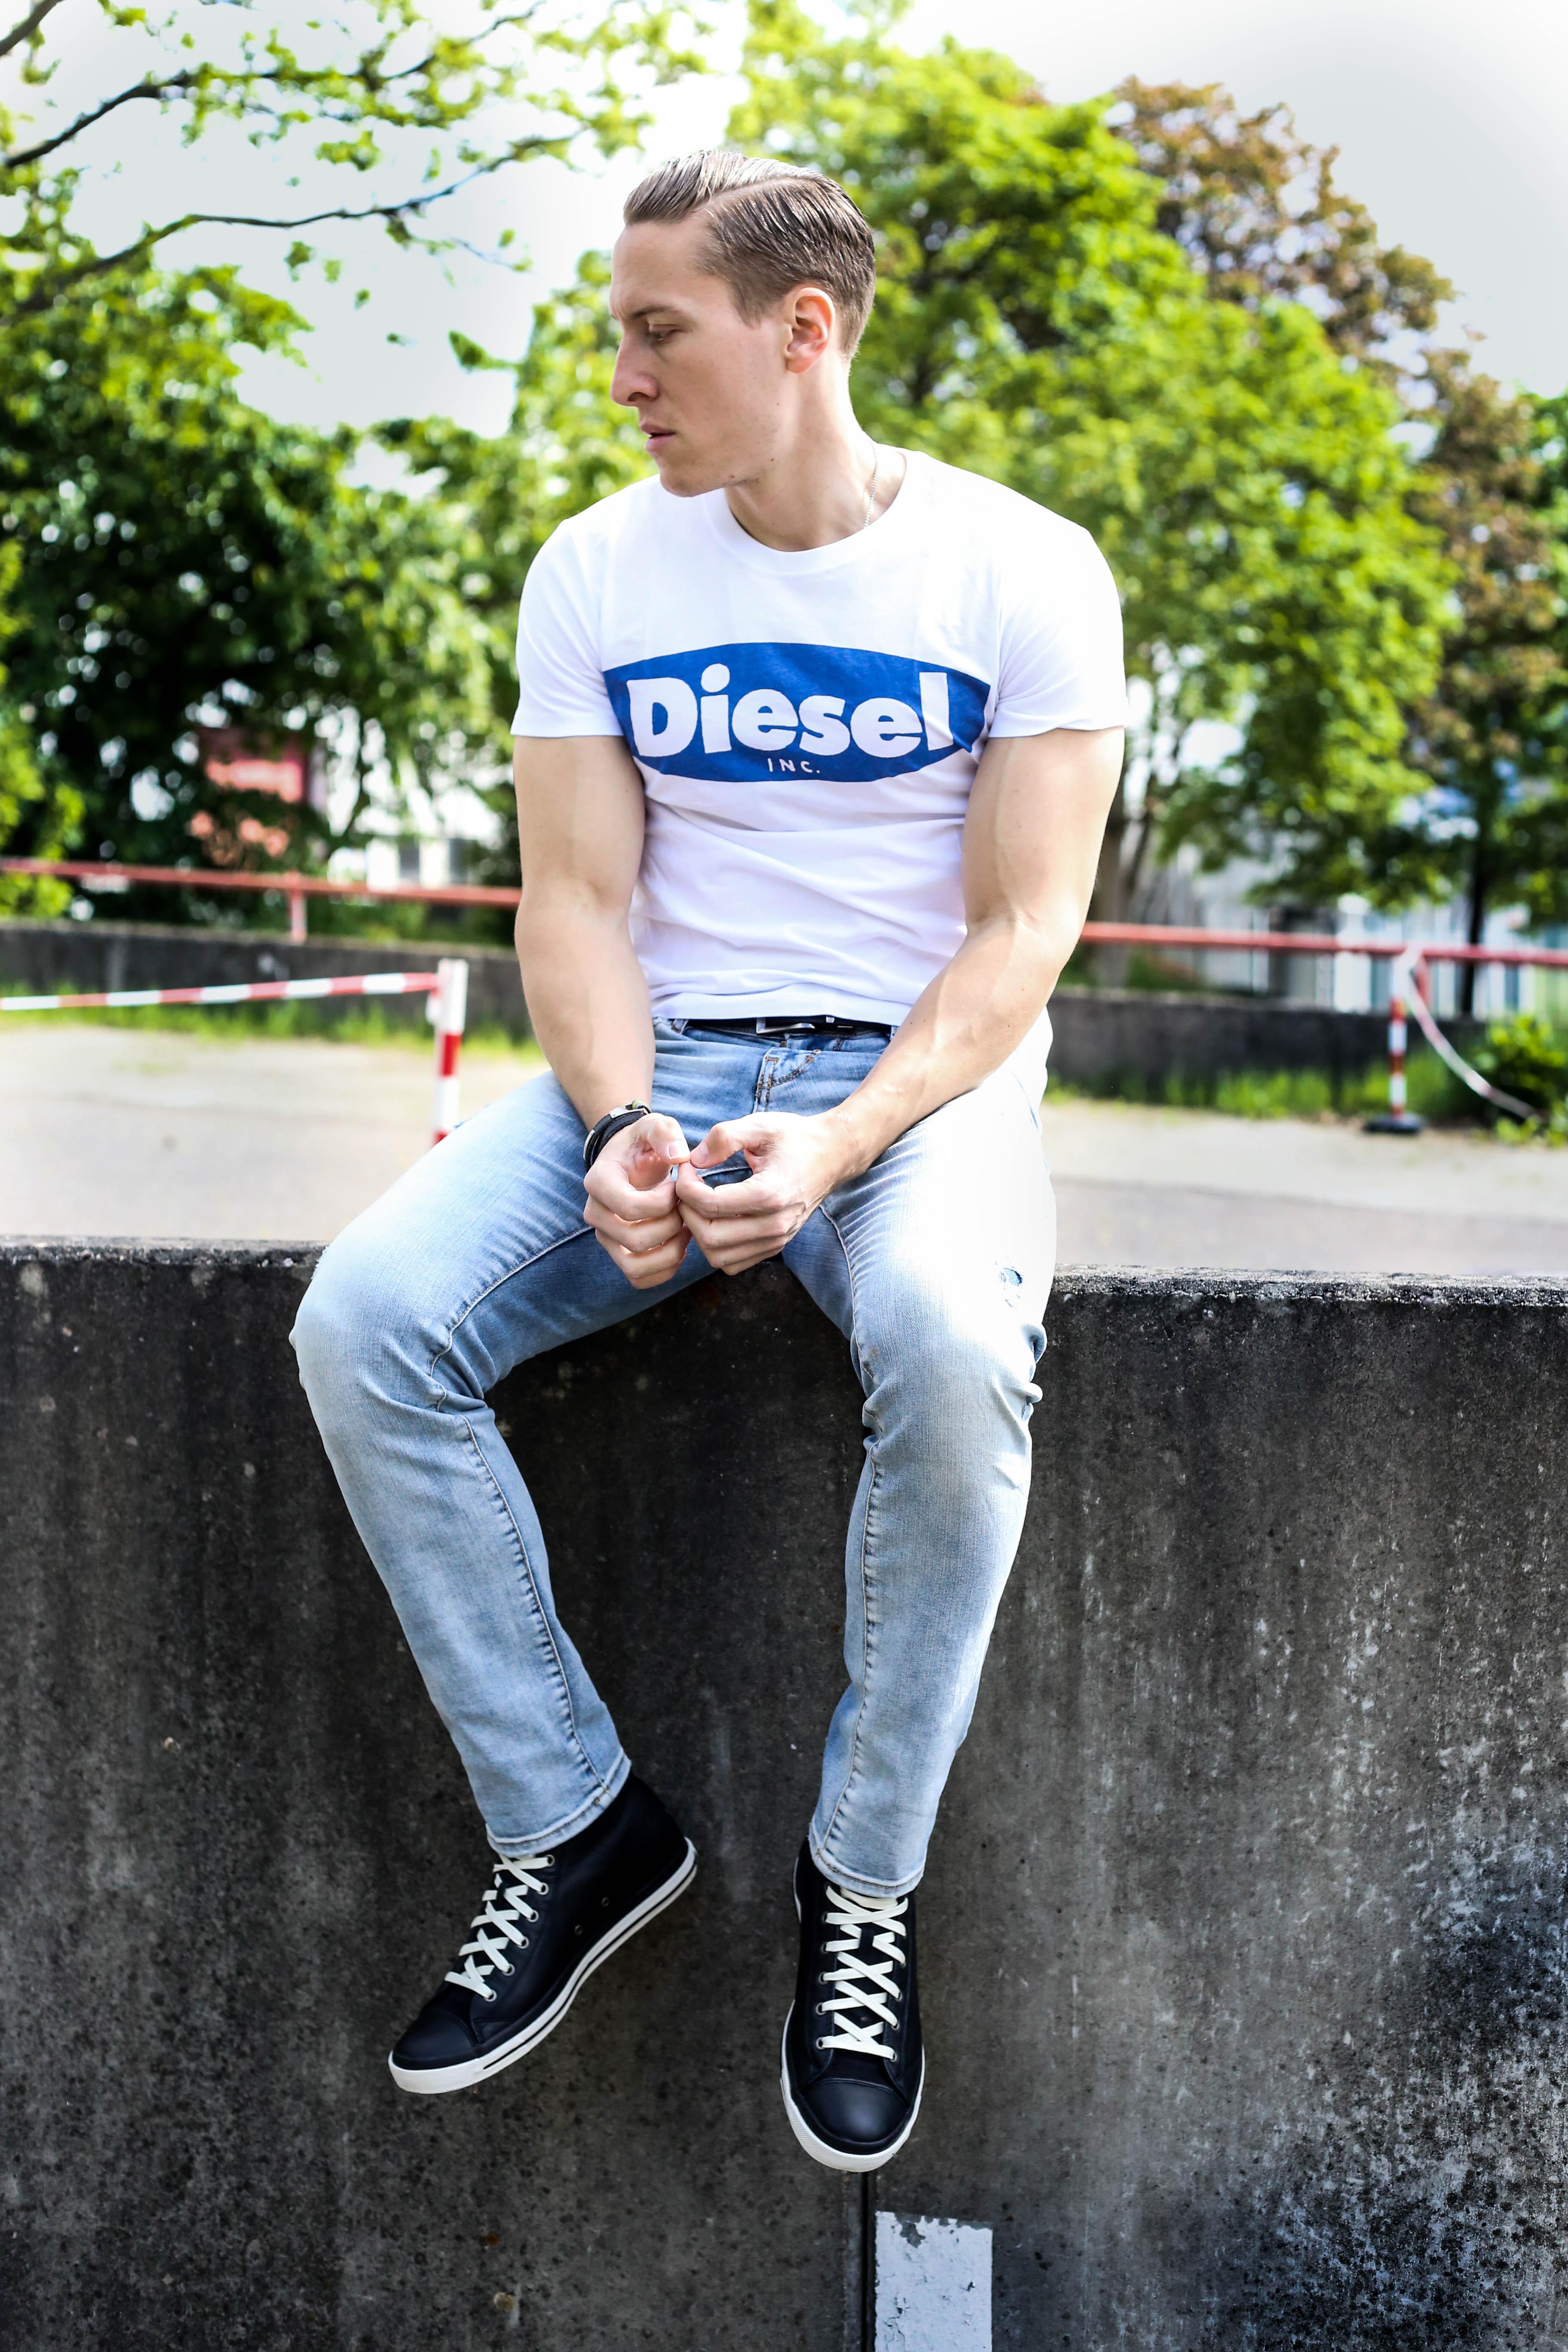 diesel-shirt-fashionlook-menfashion-männerblog-berlin-outfit_6636